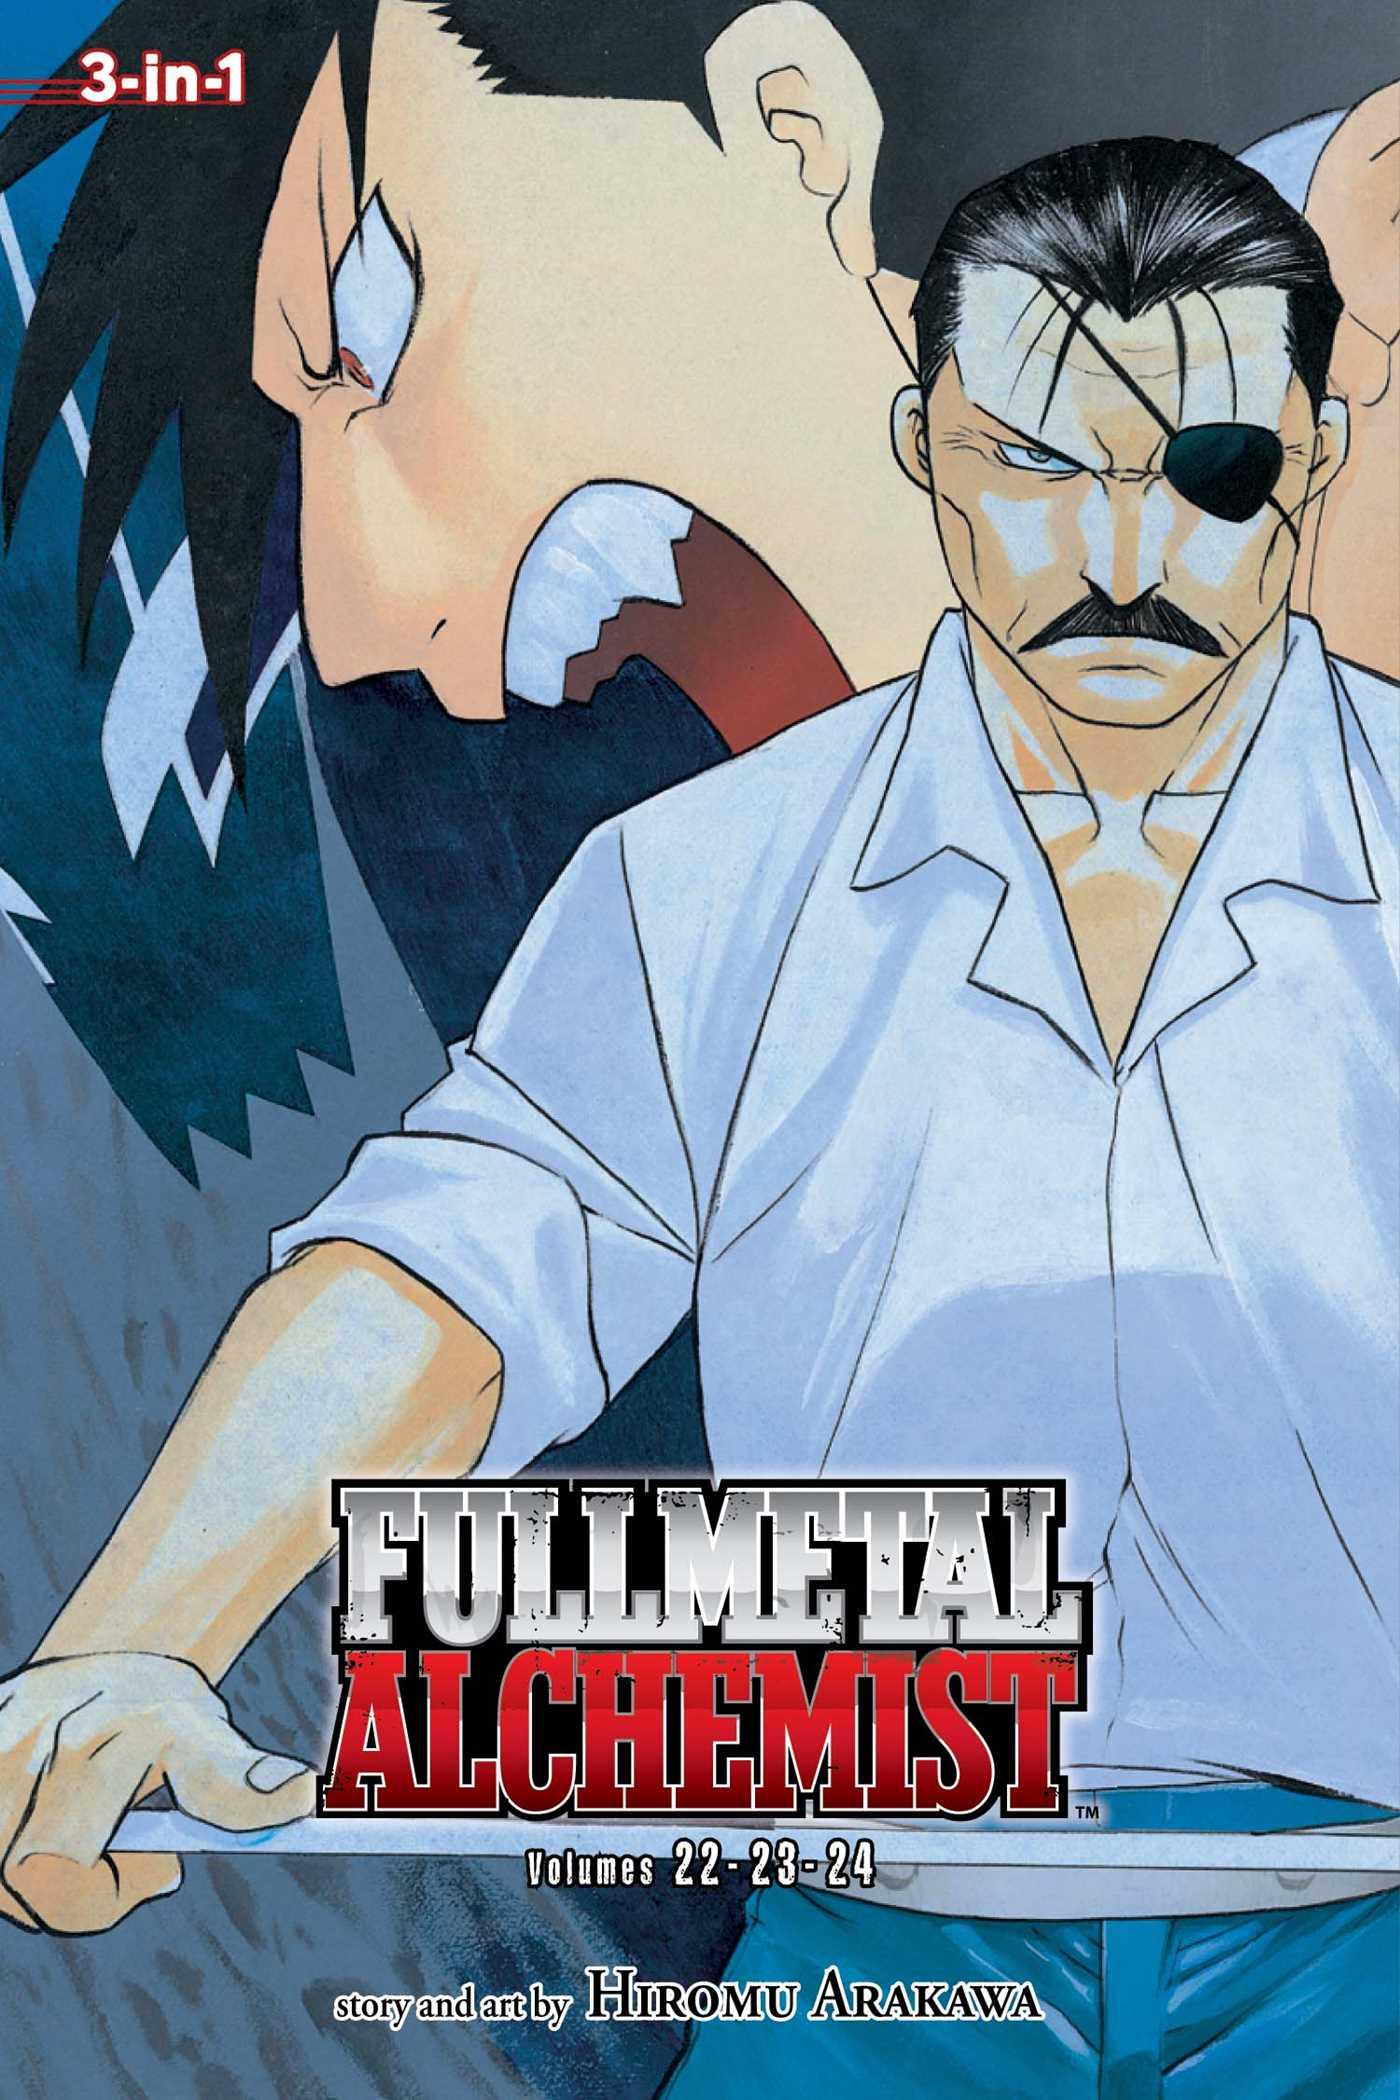 Fullmetal Alchemist (3-in-1 Edition), Vol. 8 | Book by ...